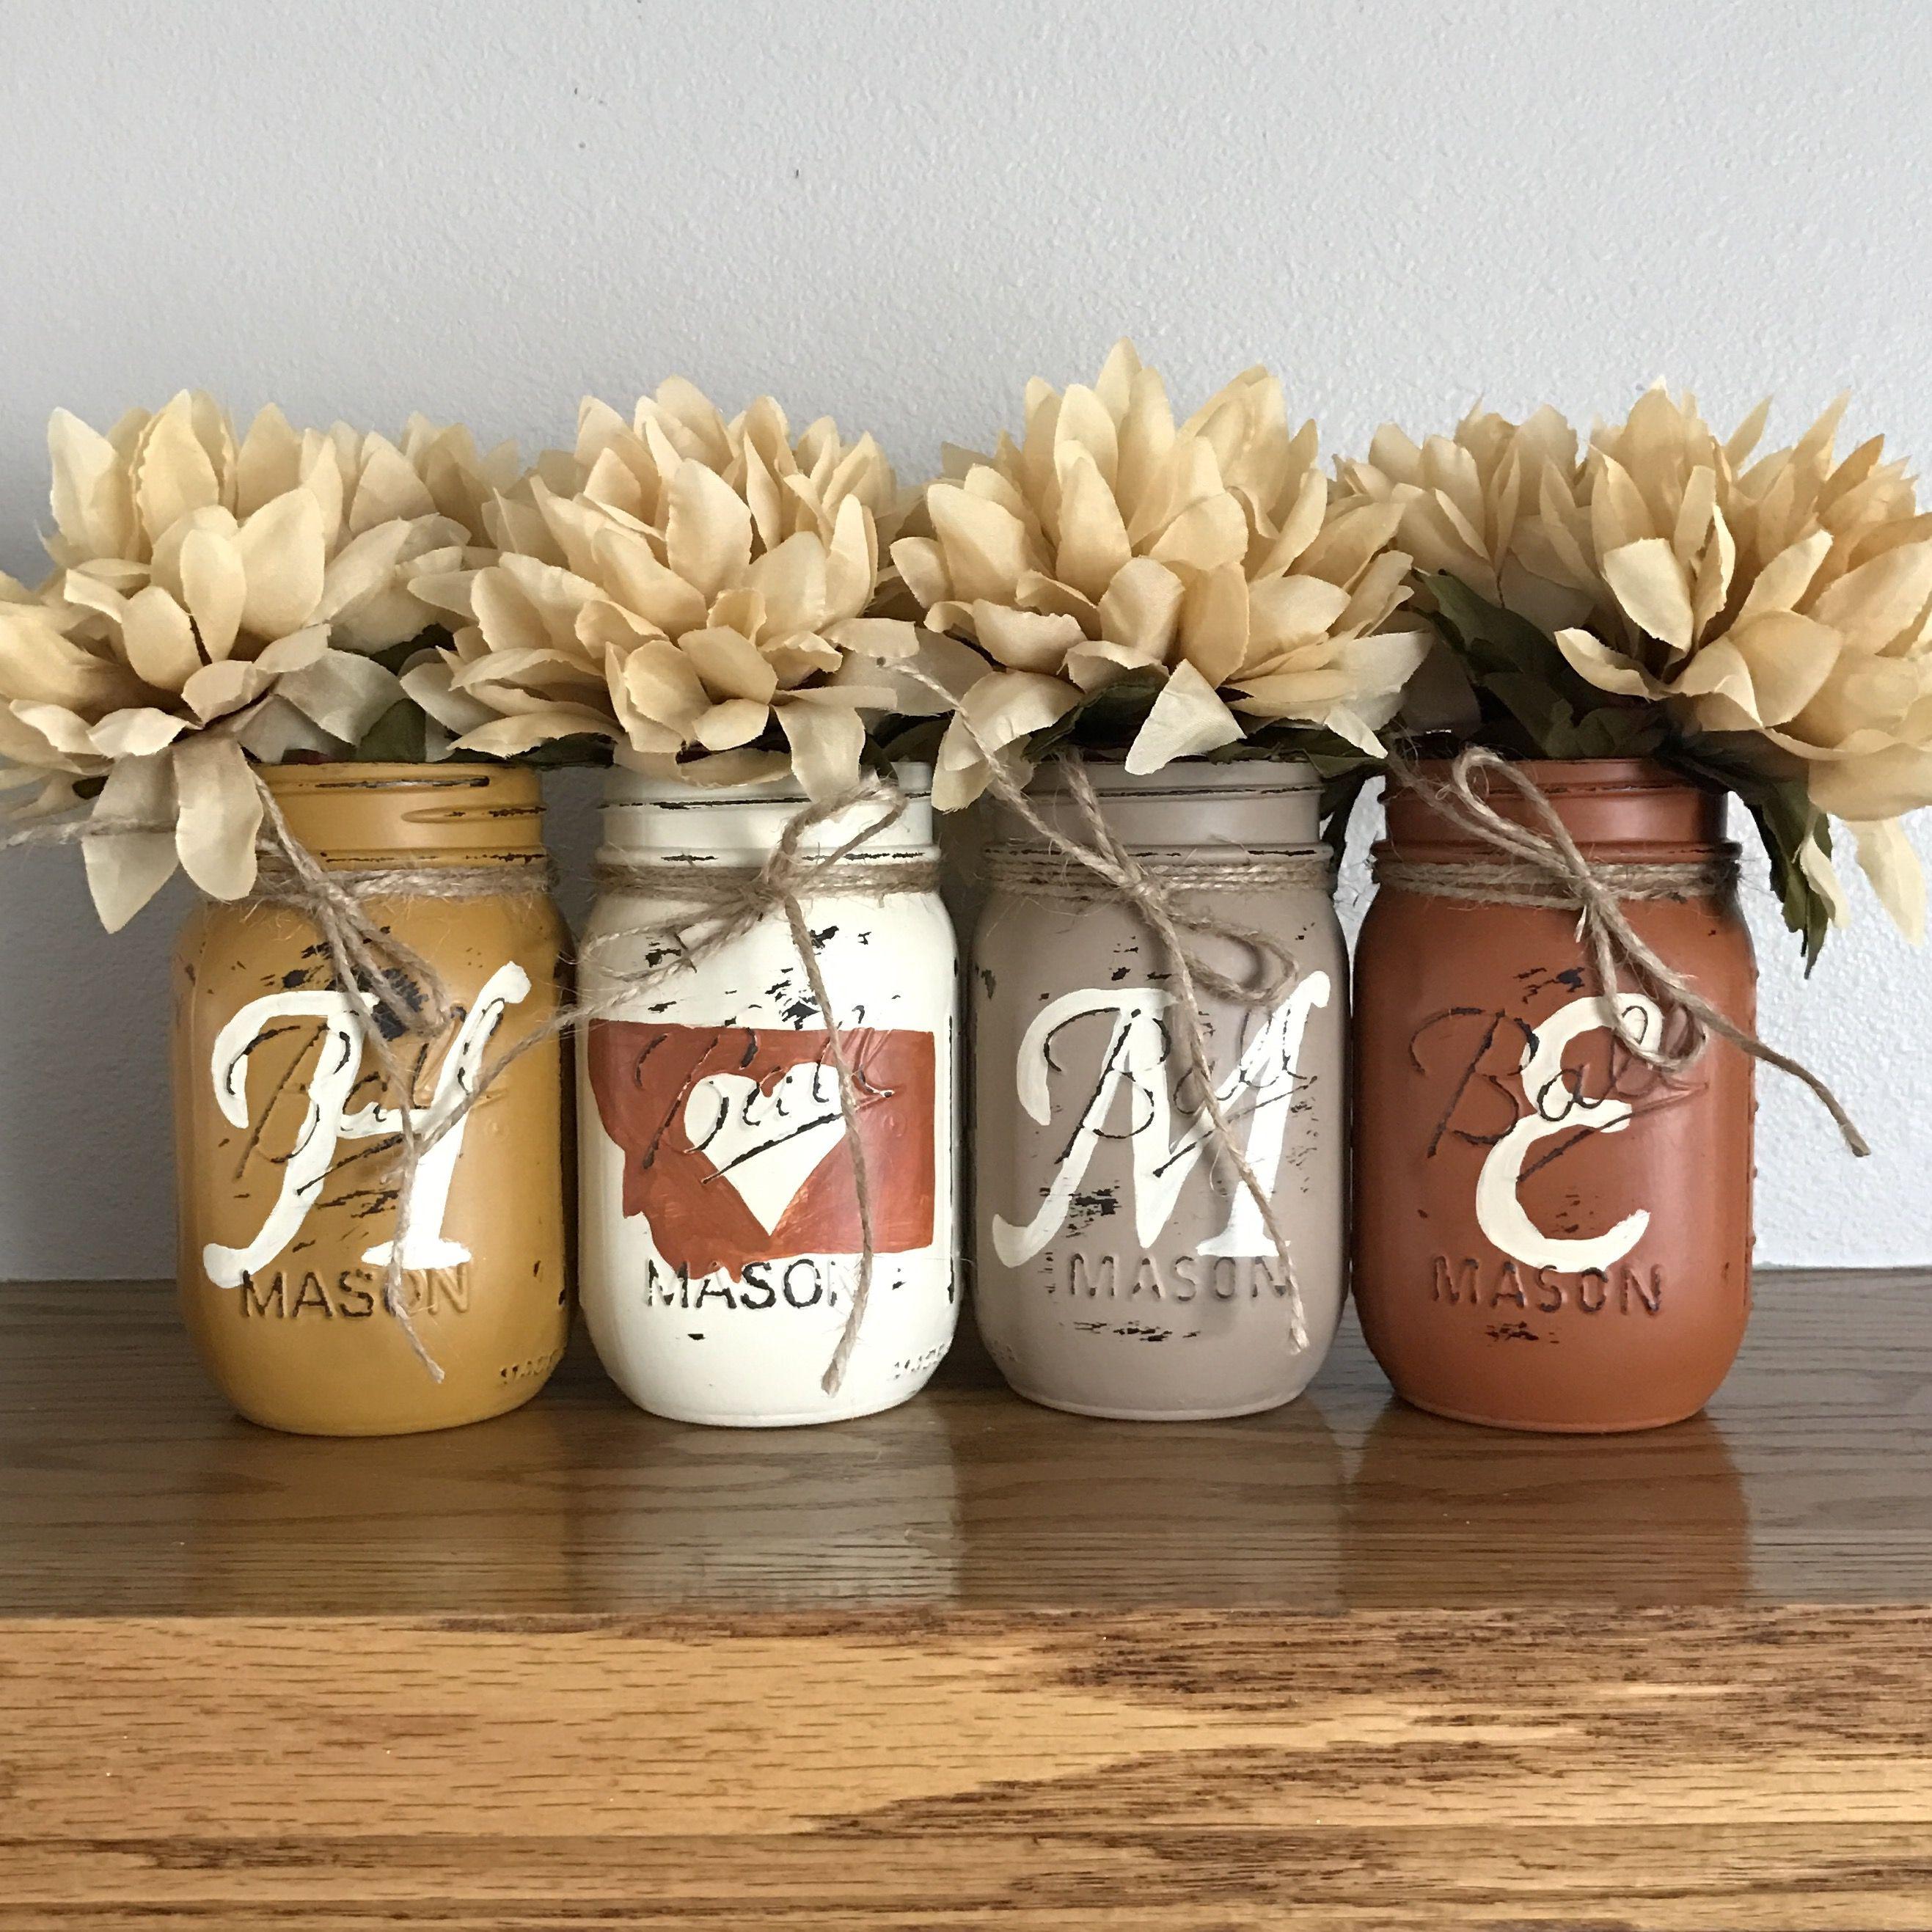 Mason Jar Home Decor Yellow Orange And Brown Montana Home Mason Jar Set  Rustic Home